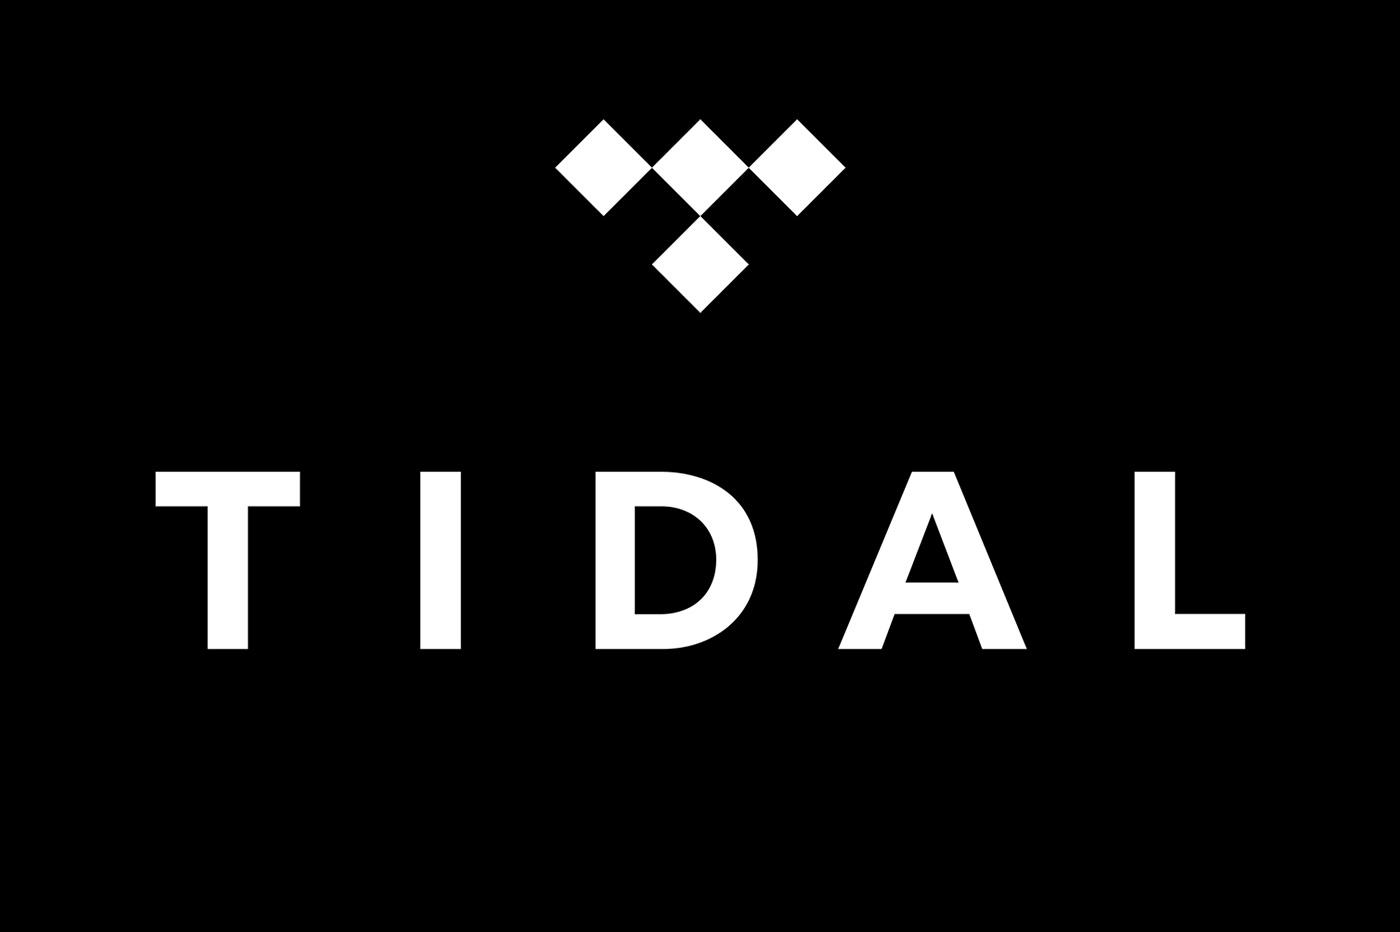 La fintech Square avale l'application de streaming musical Tidal